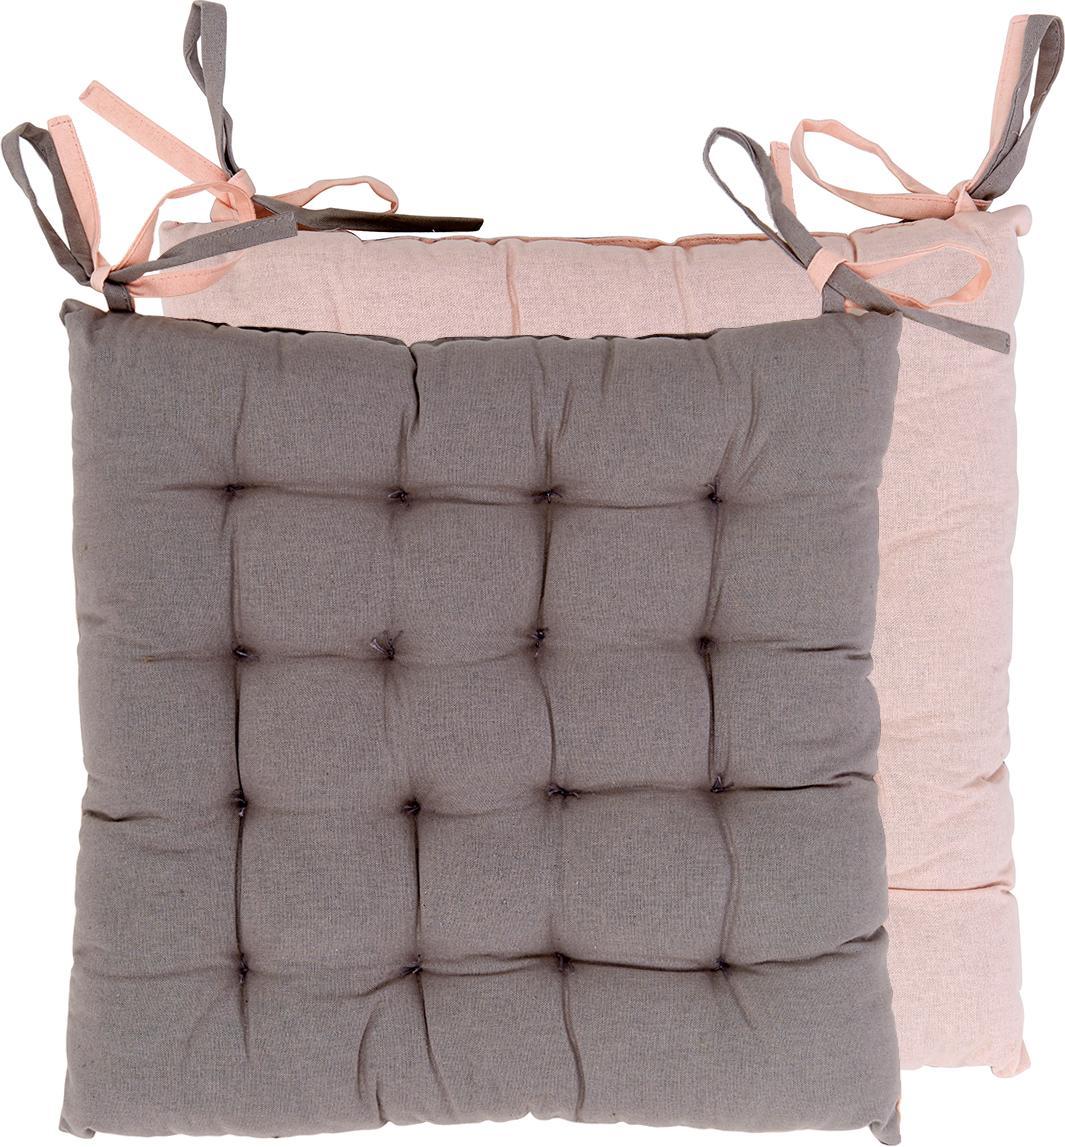 Cojines de asiento, caras distintas Duo, 2uds., Rosa palo, gris, An 40 x L 40 cm